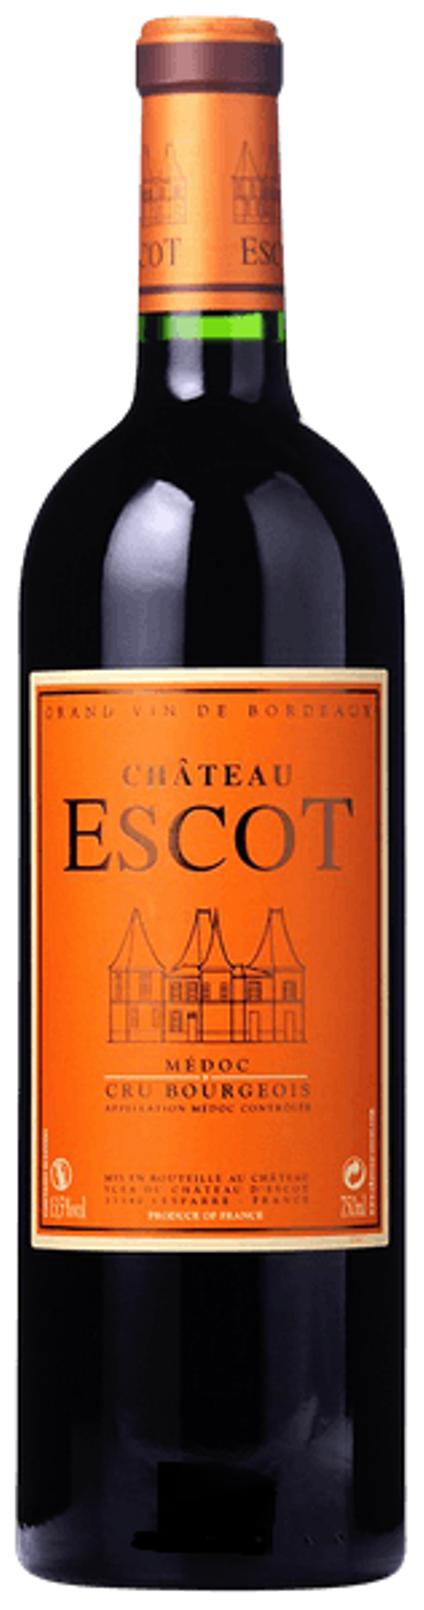 Chateau Escot AOC 2016, 0,375 l, Medoc